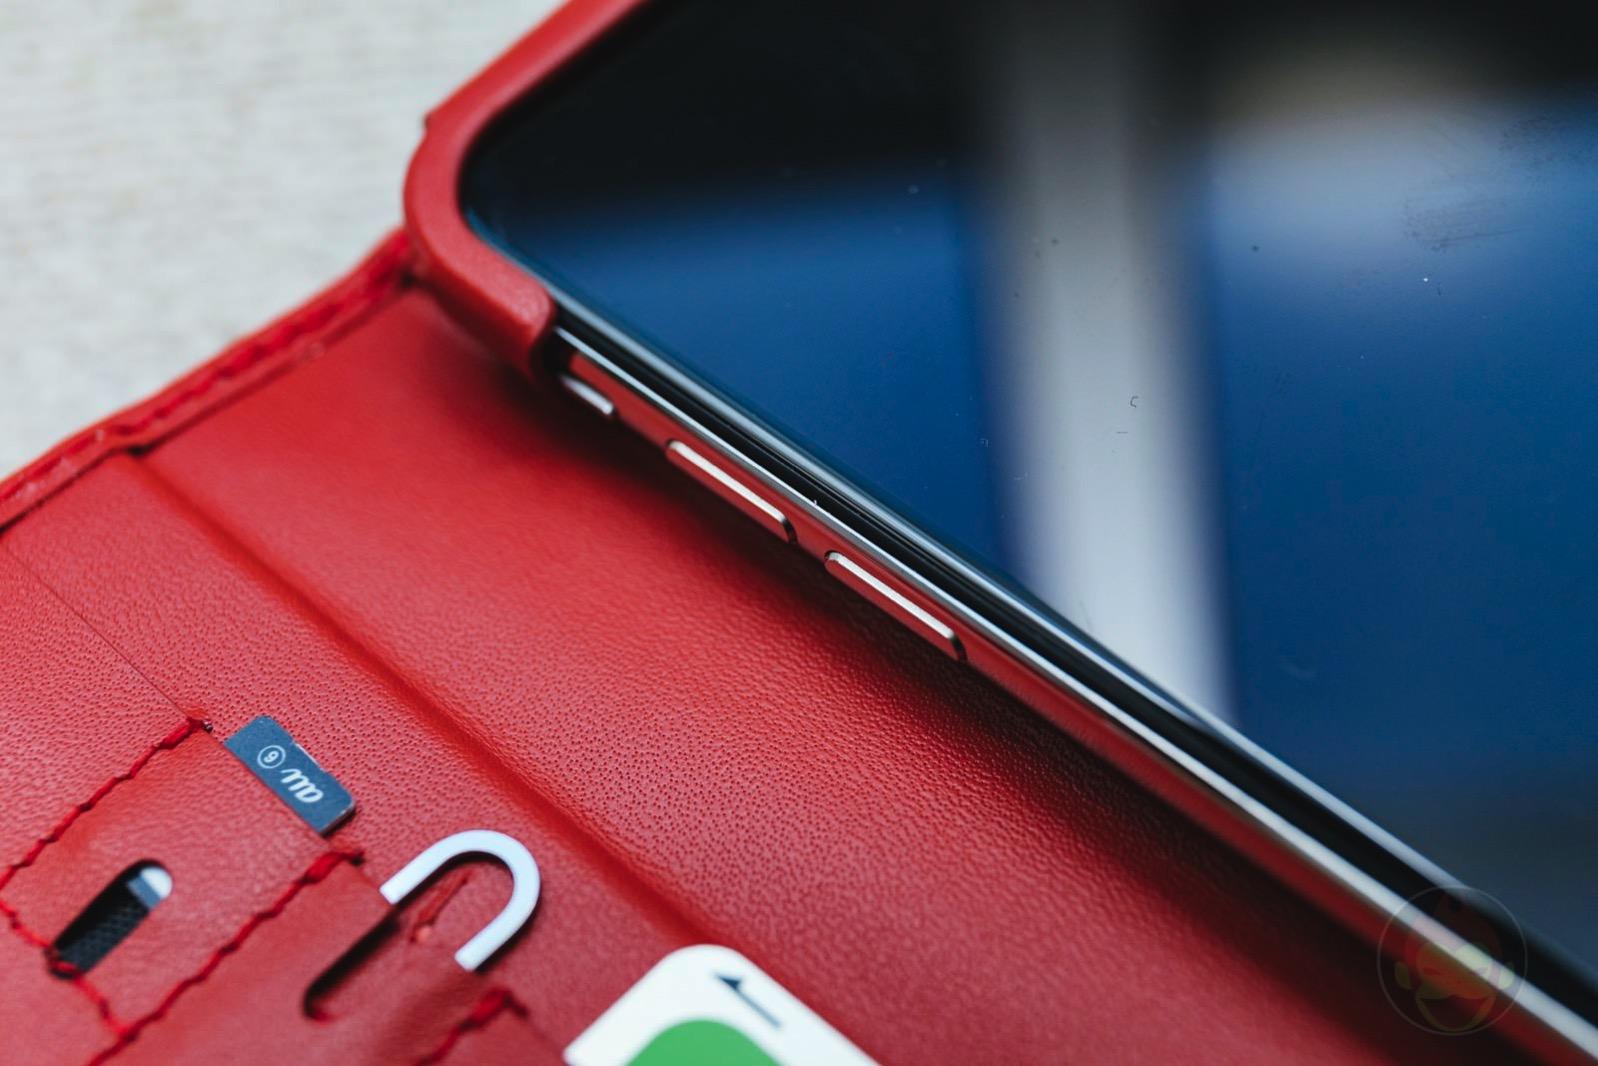 GRAMAS-Full-Leather-Case-Red-for-iPhoneX-SIM-PIN-09.jpg